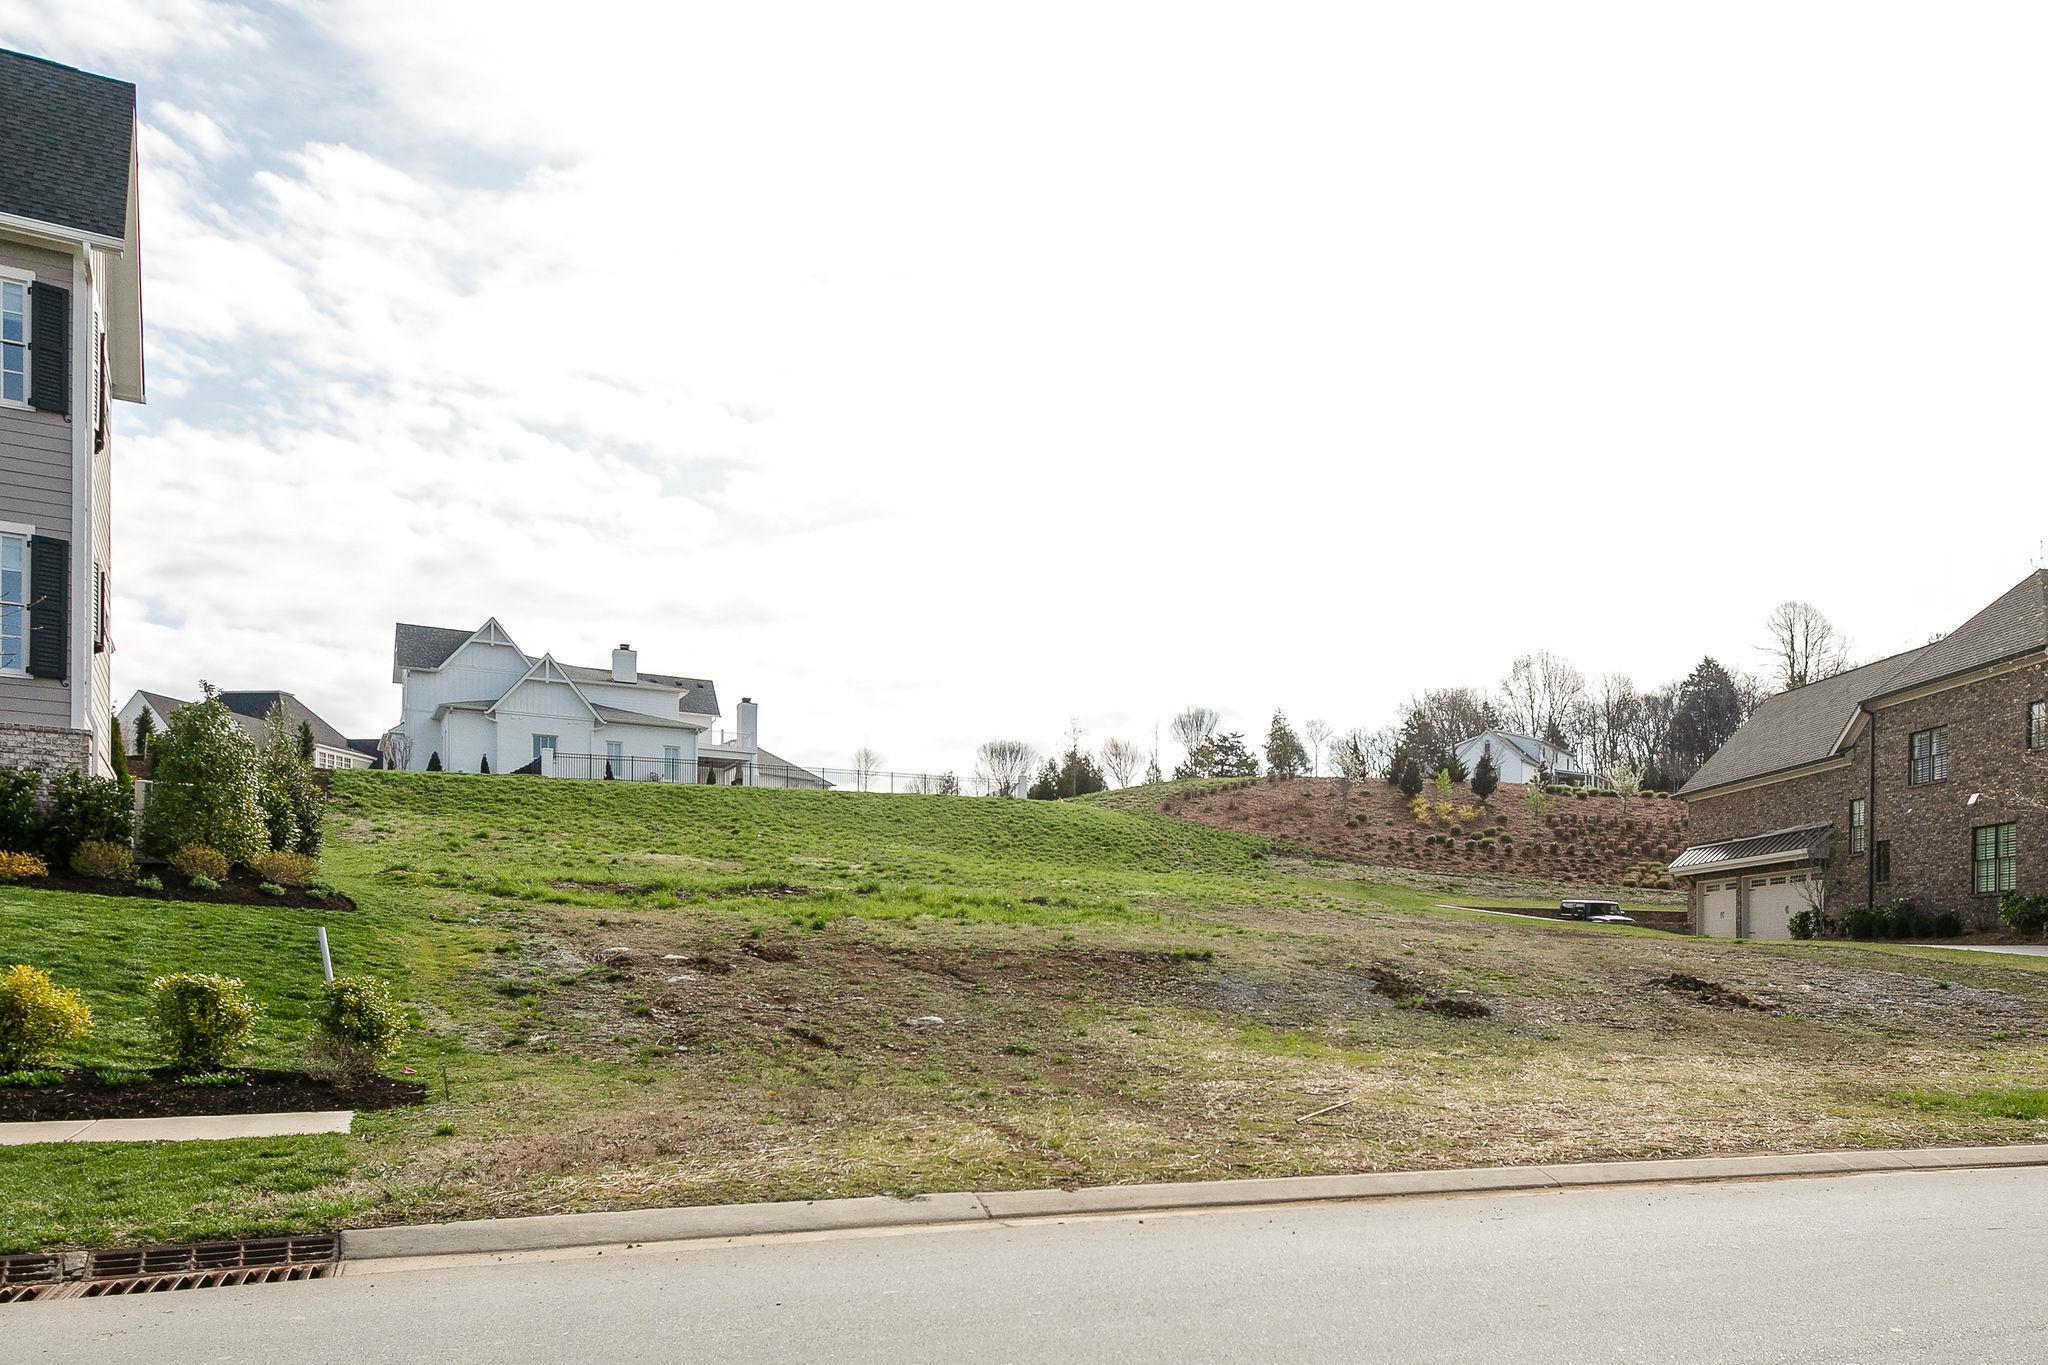 8424 Heirloom Blvd, College Grove, TN 37046 - College Grove, TN real estate listing